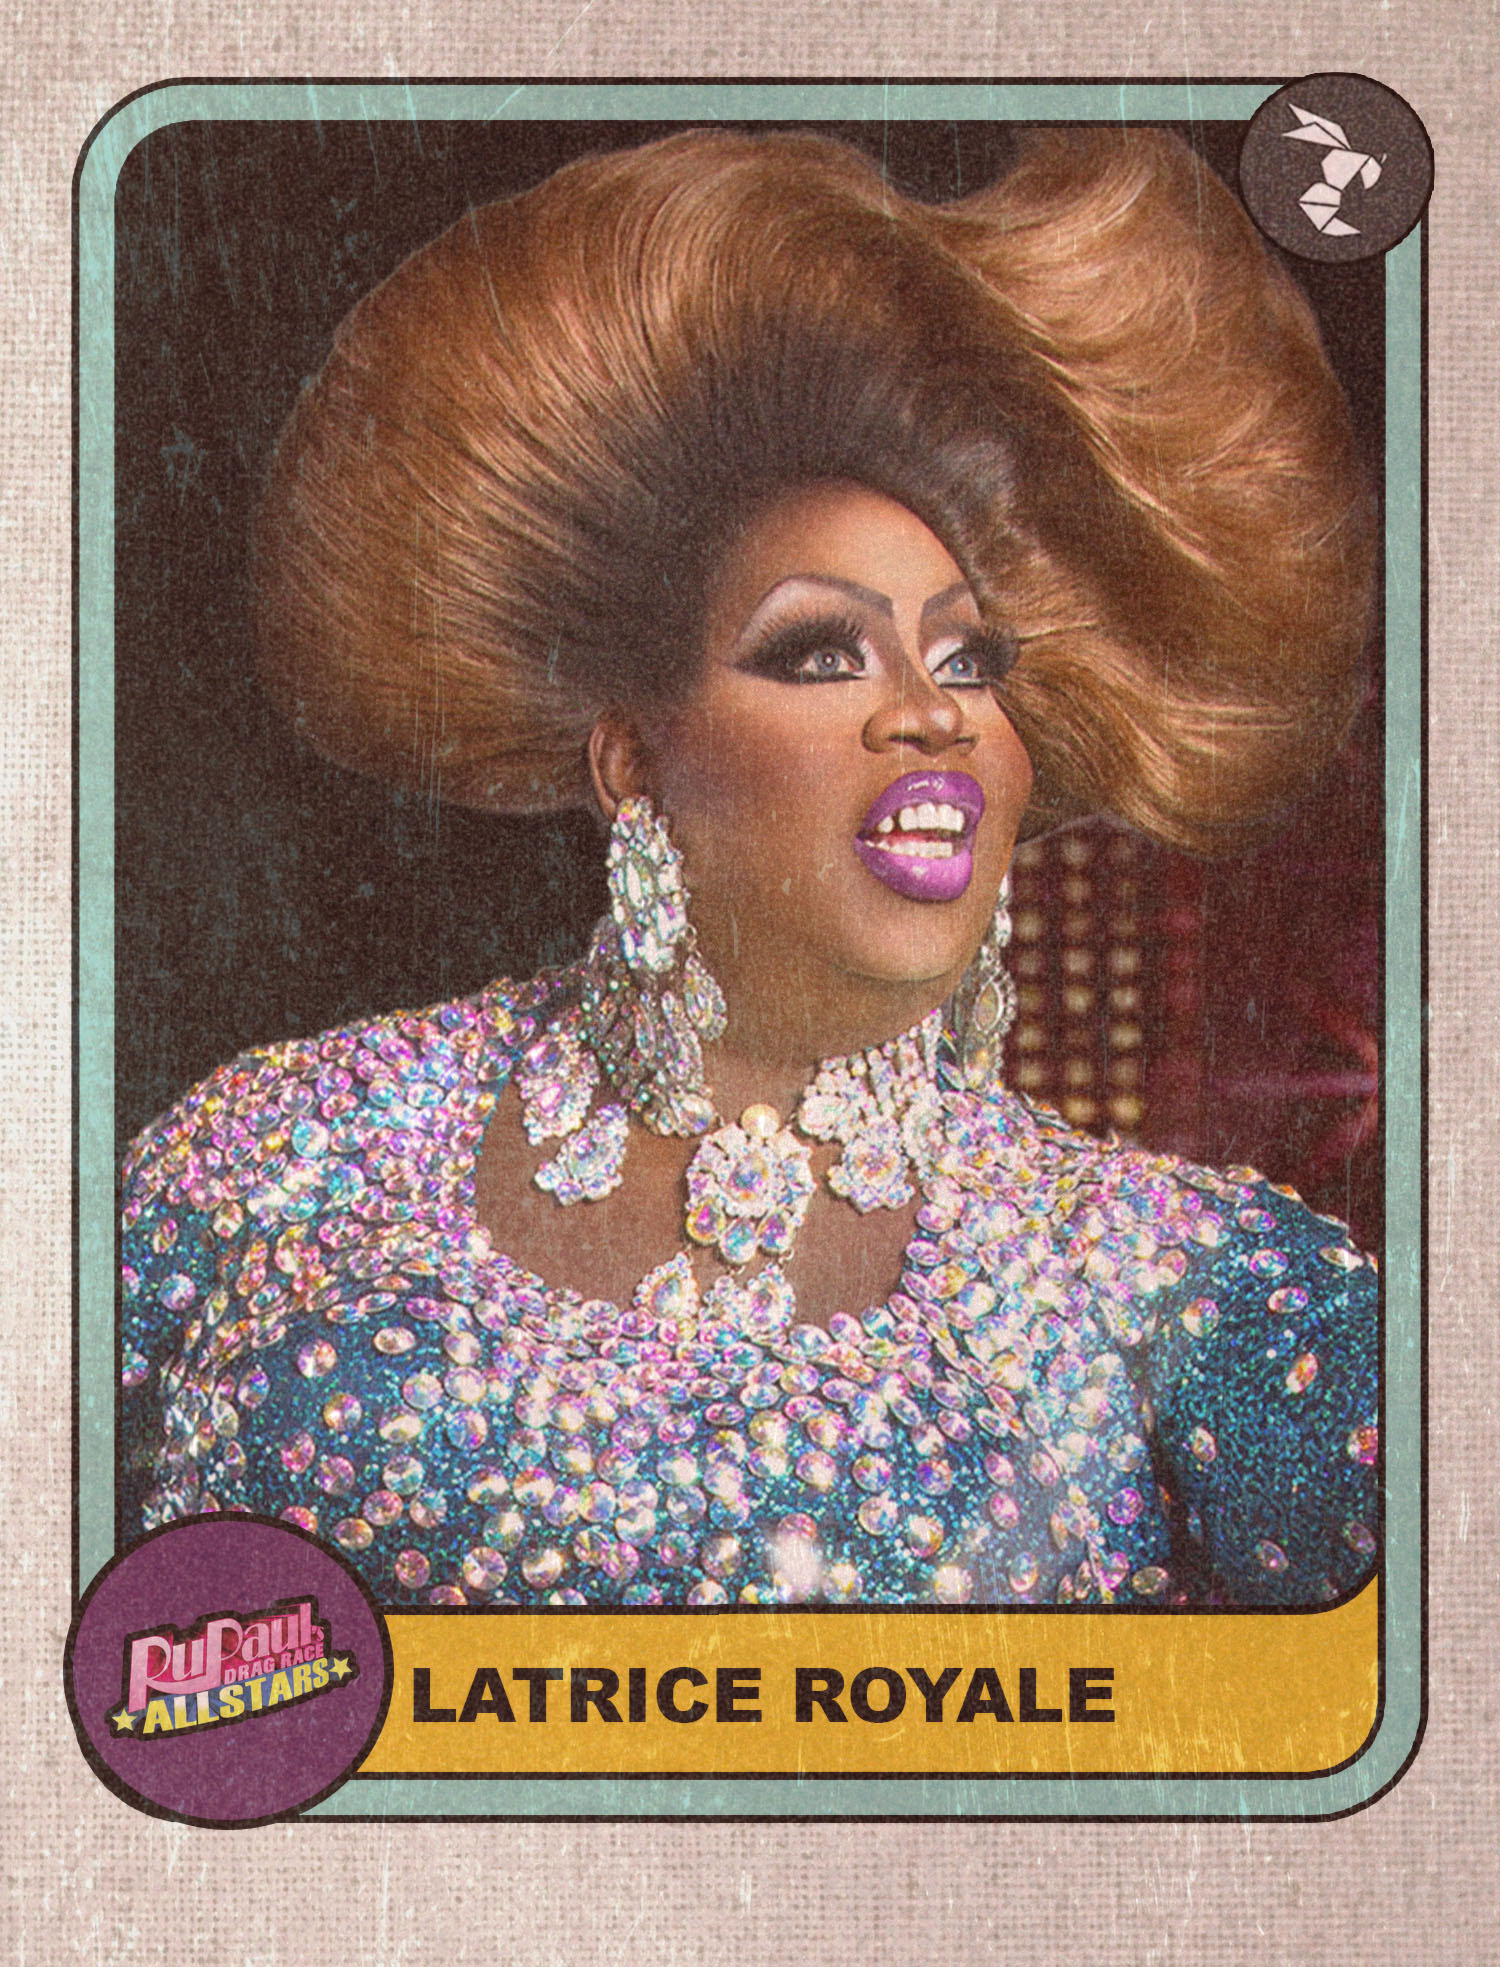 latrice royale card